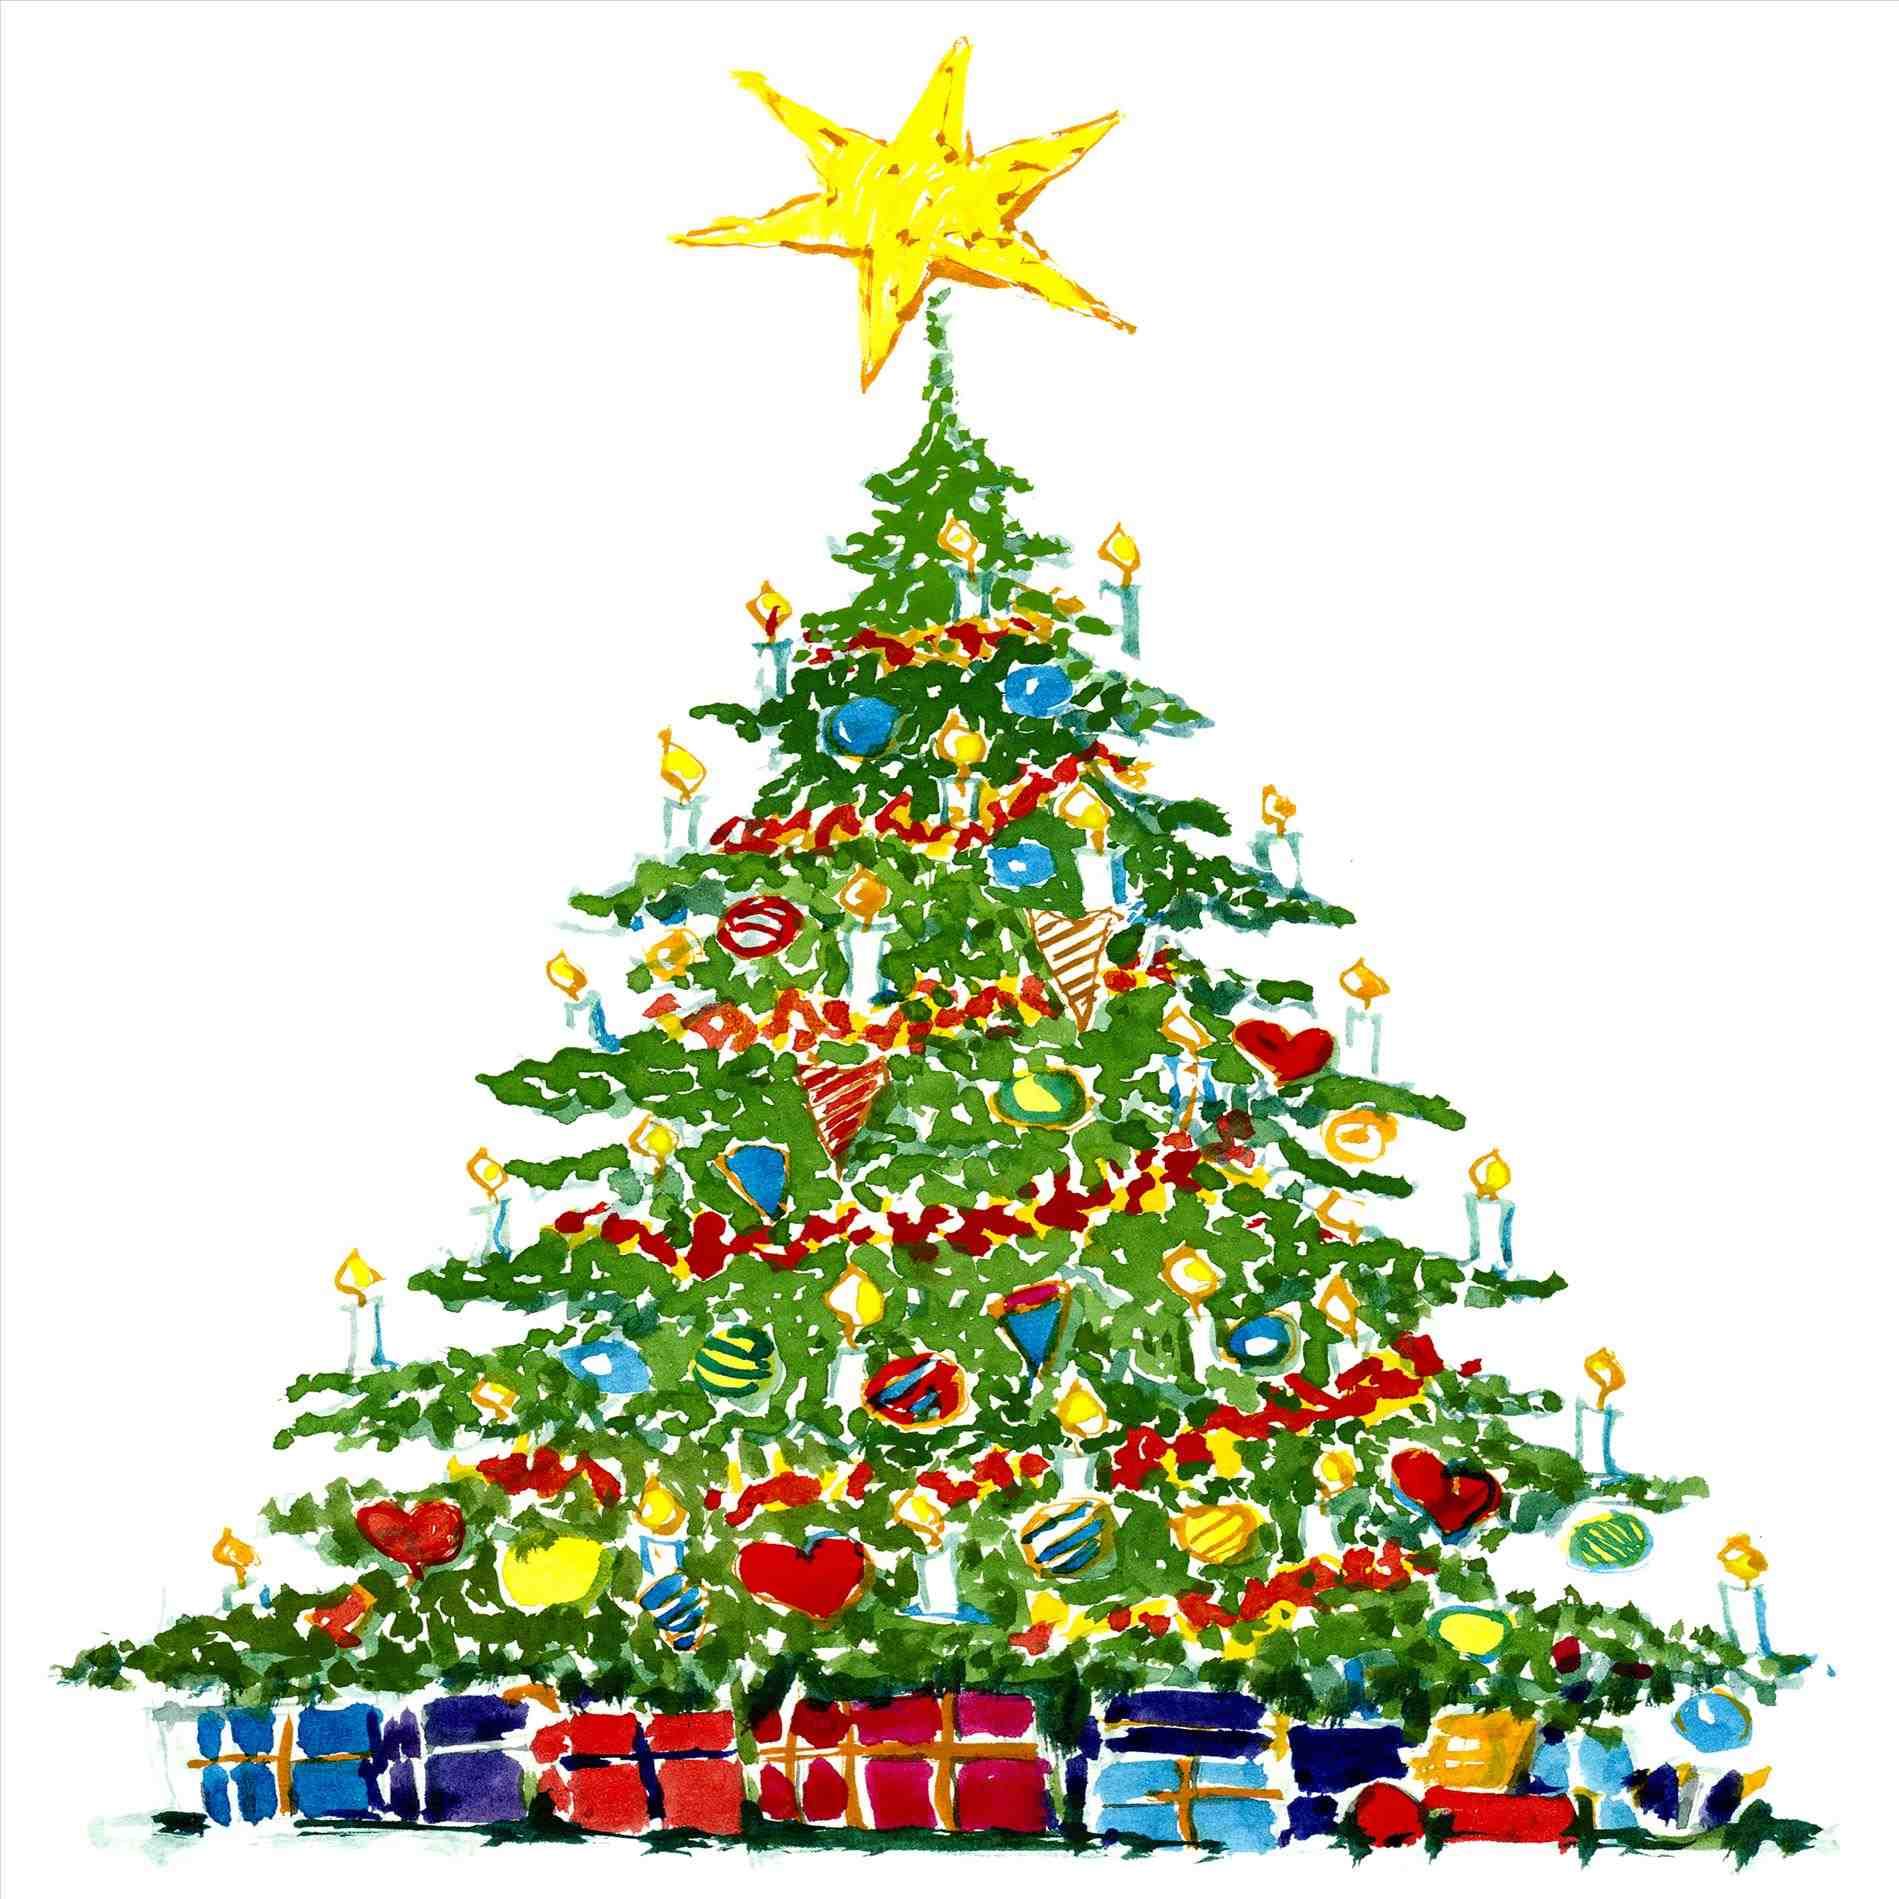 1899x1899 Christmas Tree Background Clipart Cheminee.website